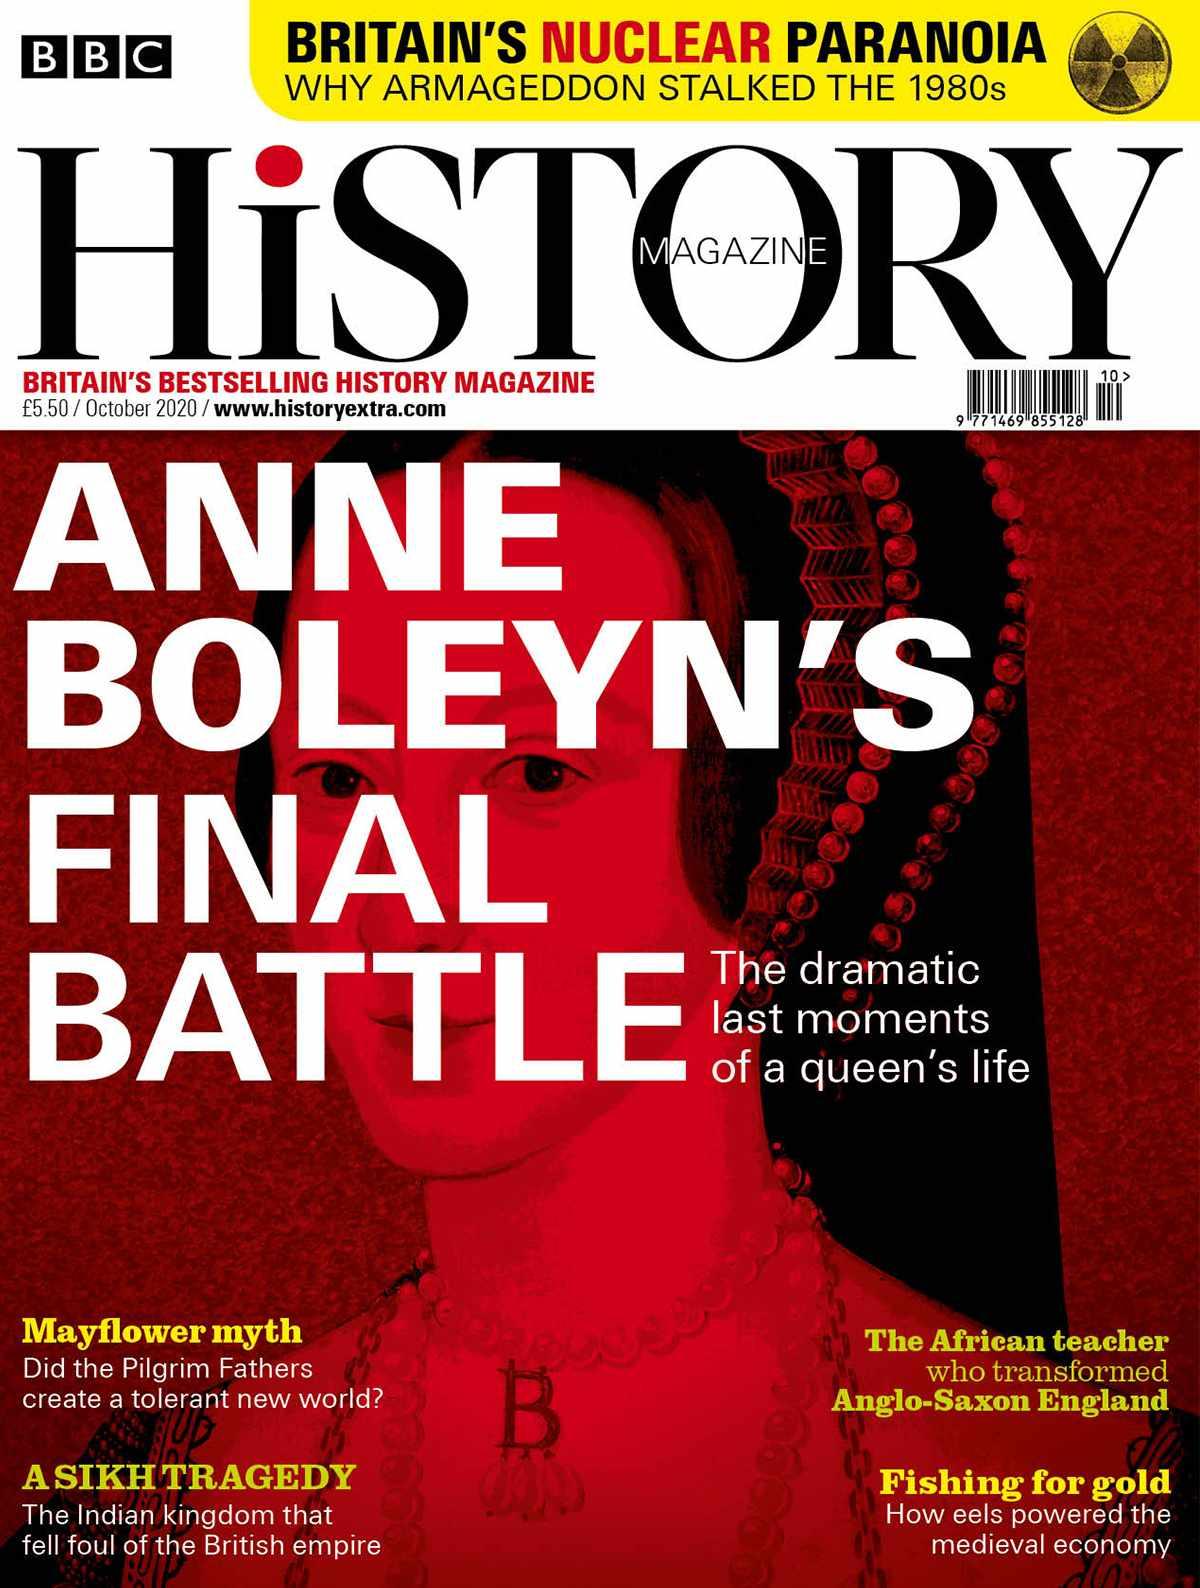 BBC History Magazine October 2020